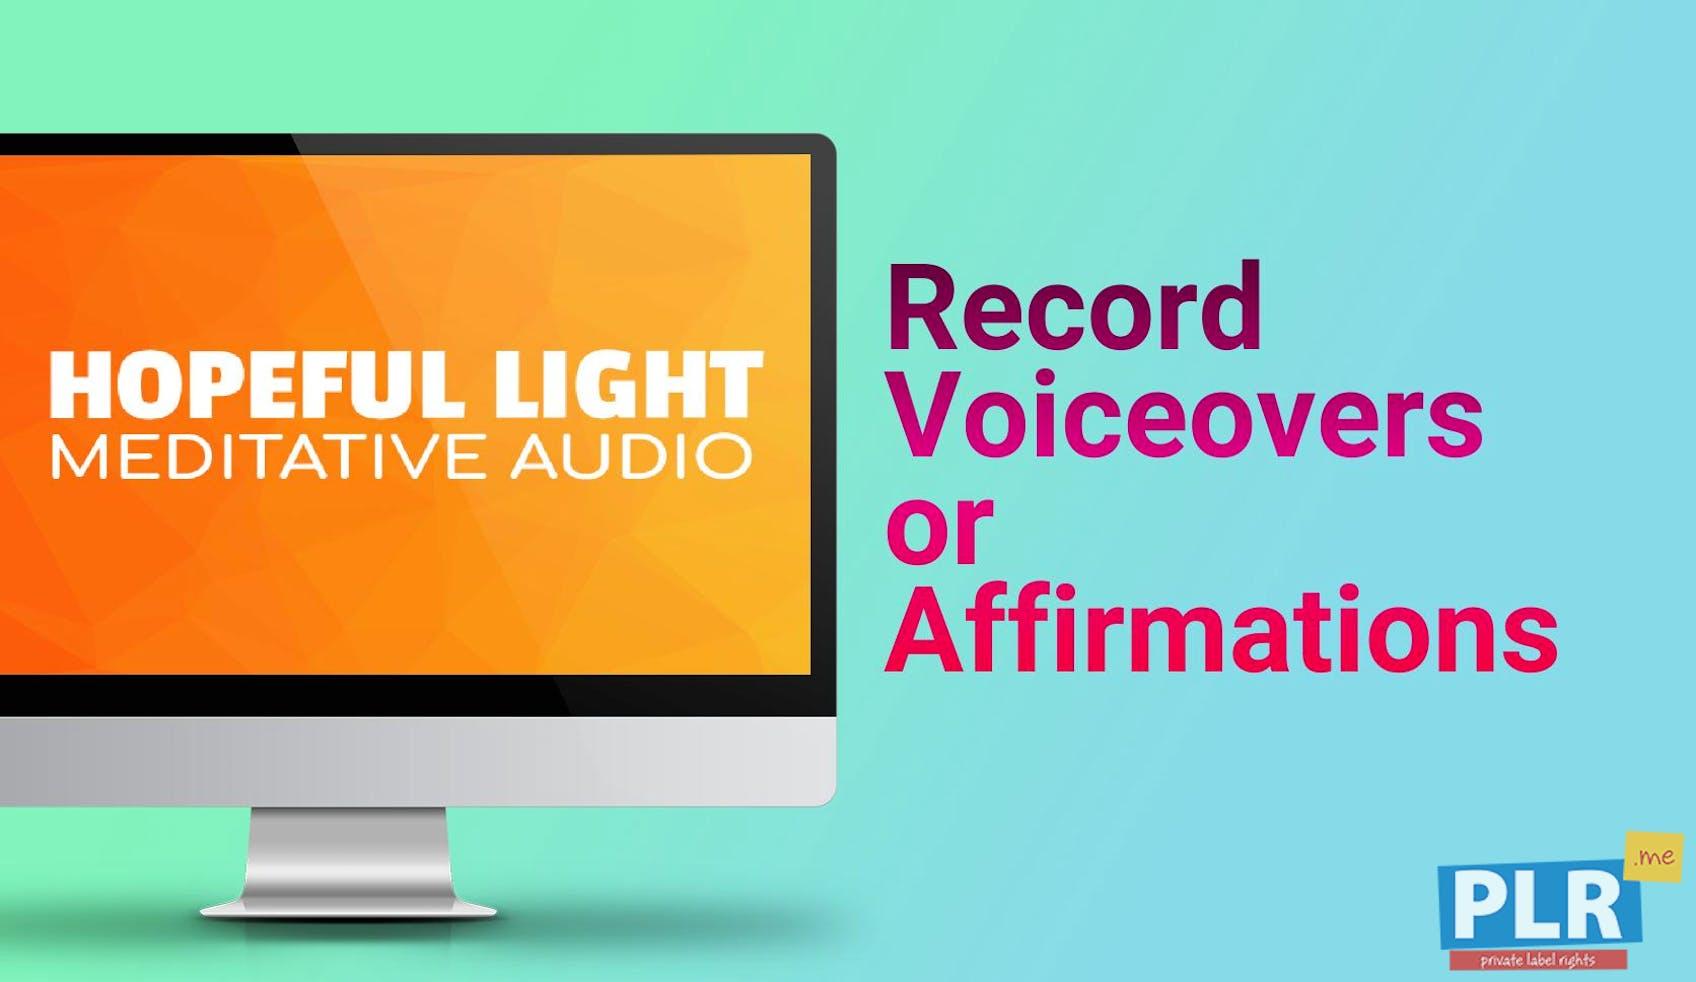 Hopeful Light - Meditative Audio